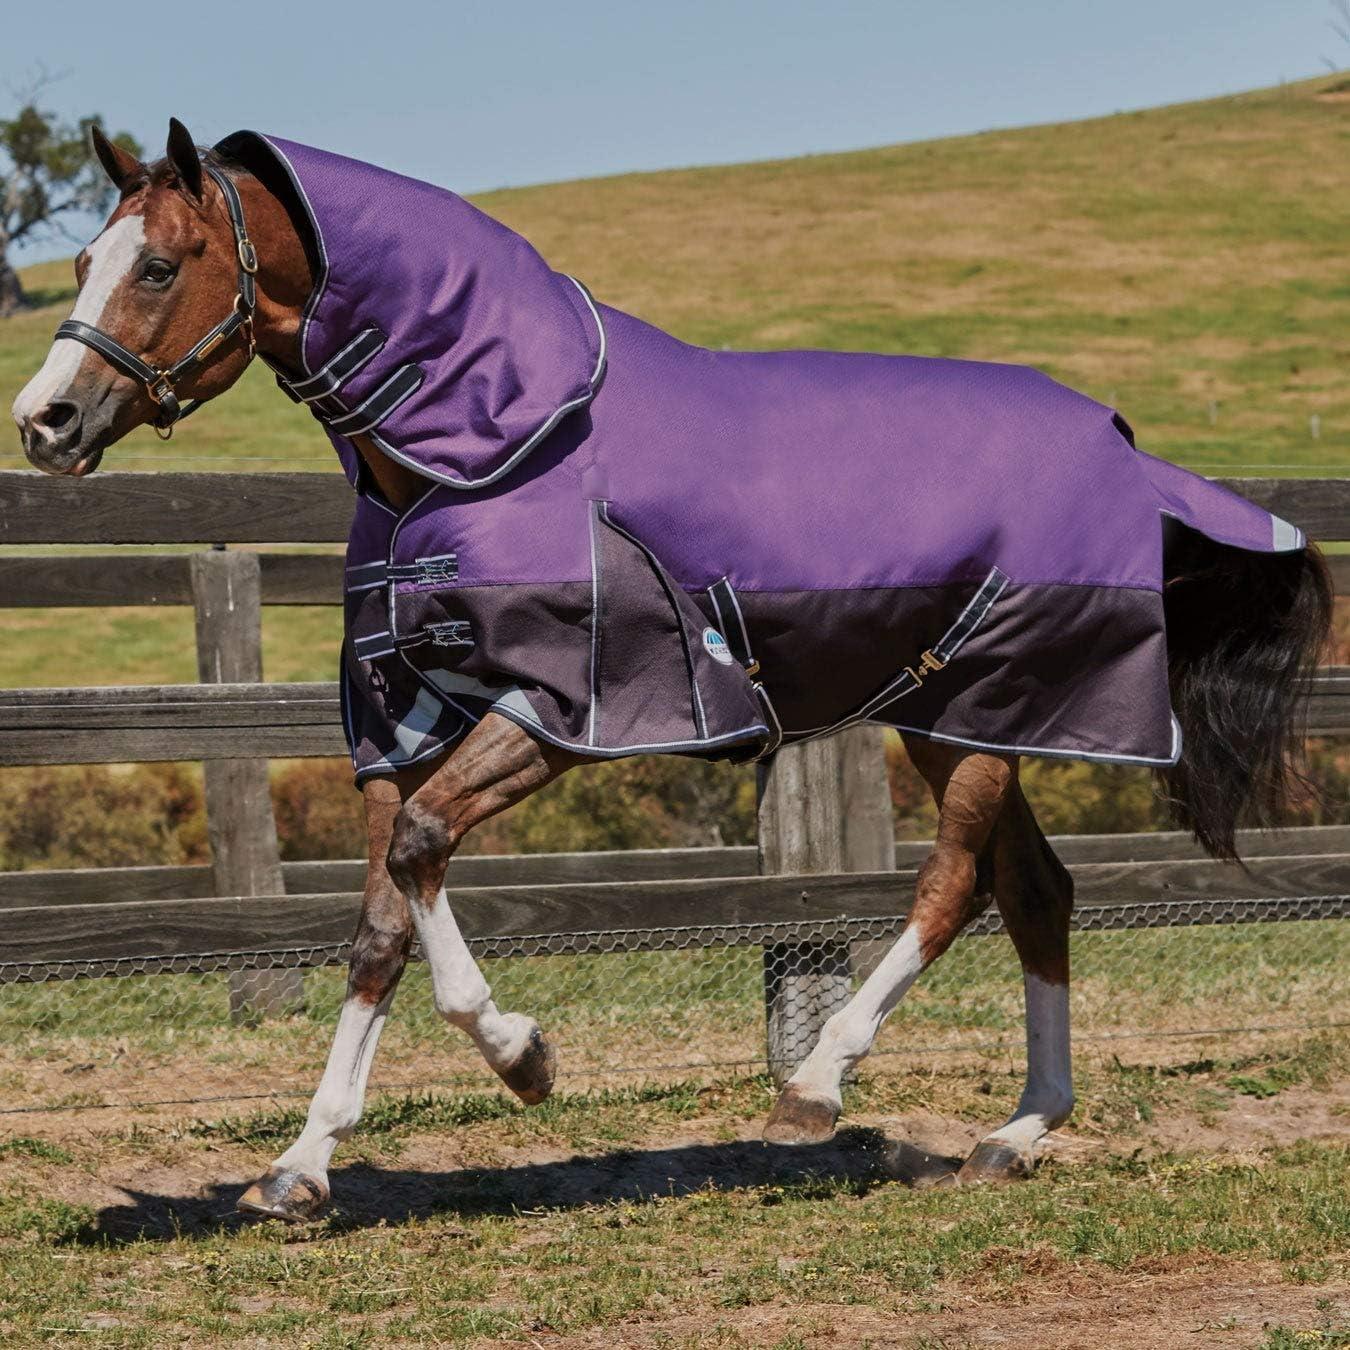 Manta para caballos Weatherbeeta Comfitec Plus Dynamic Detach-A-Neck Medium, Purple & Black, 5' 9